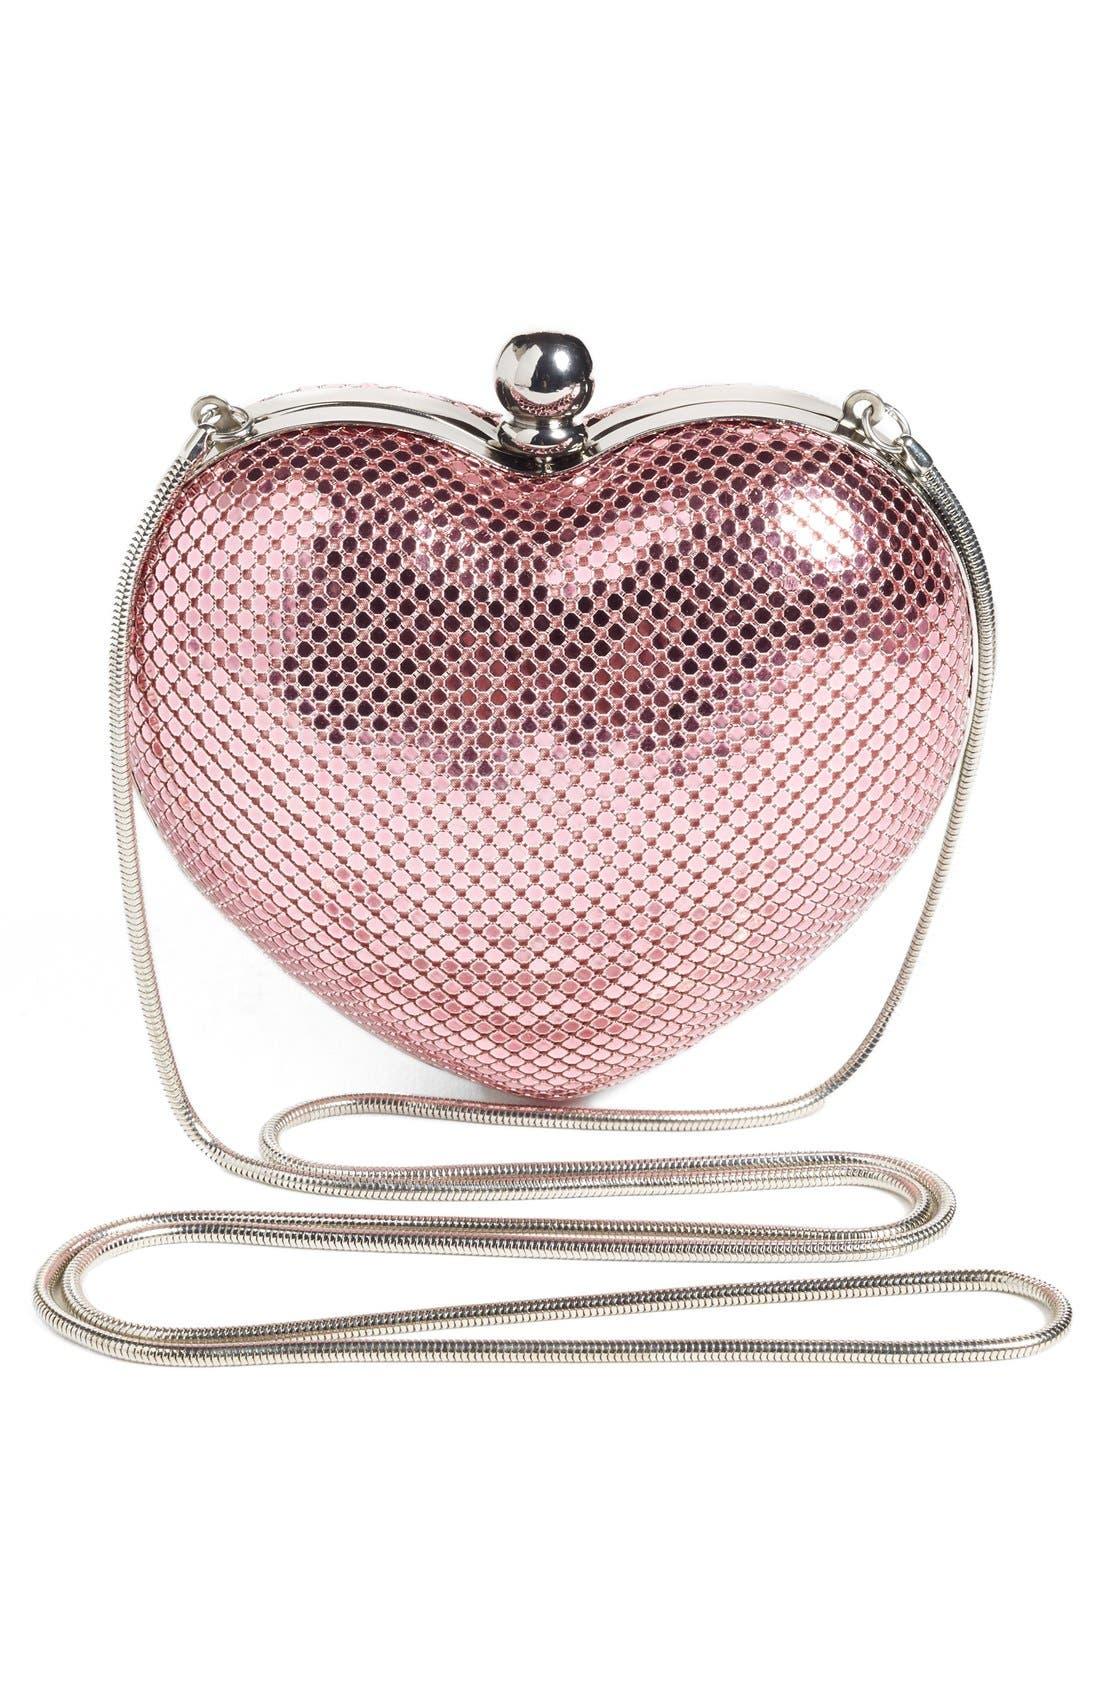 'Charity Heart' Minaudière,                             Alternate thumbnail 4, color,                             PINK